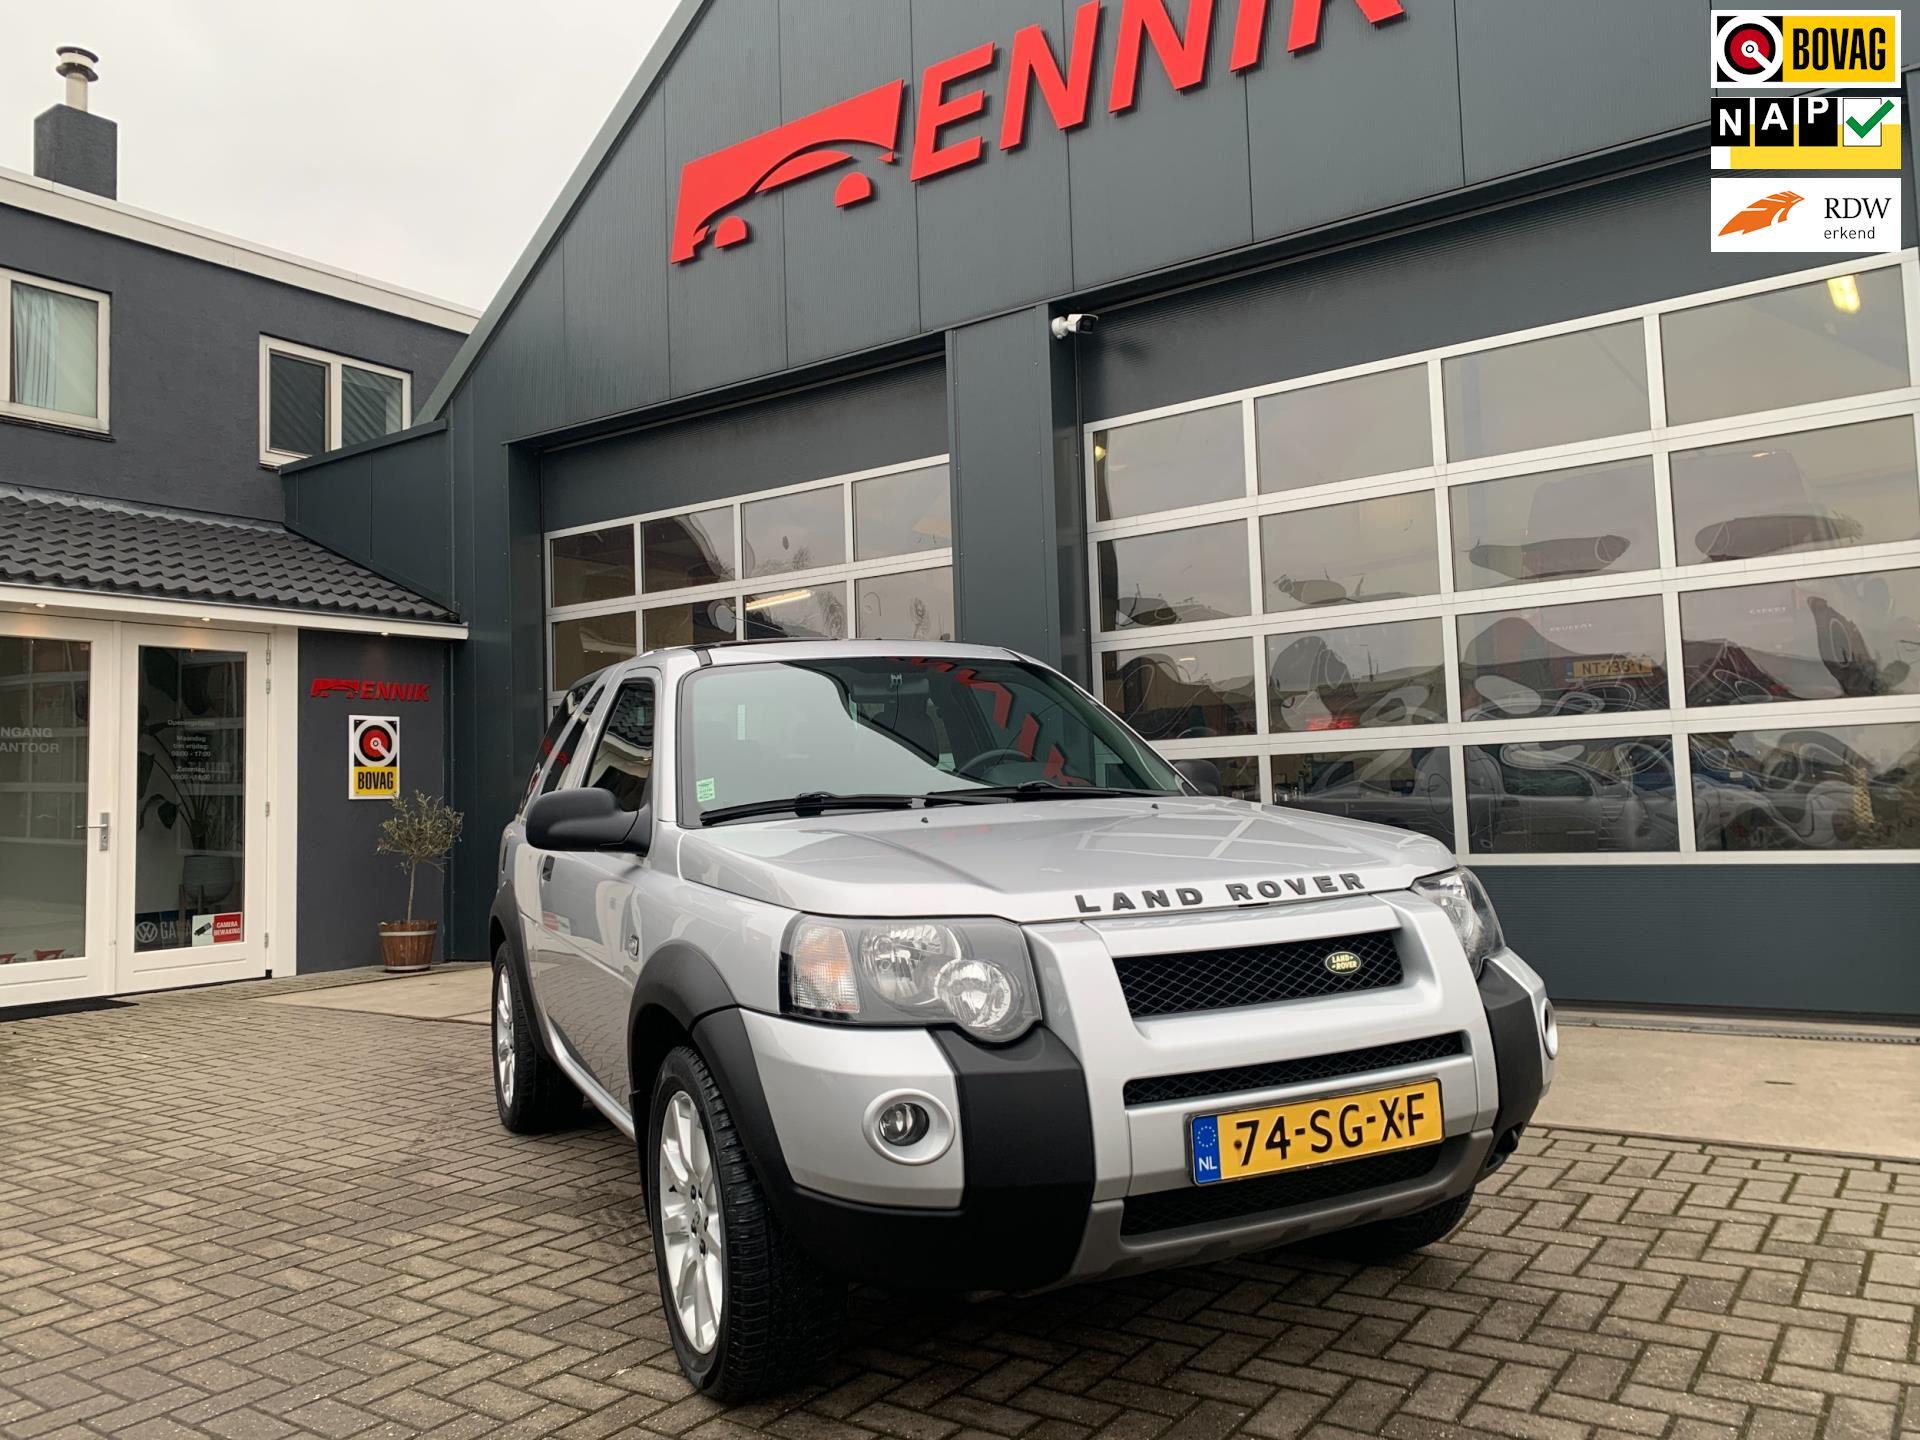 Land Rover Freelander Hardback occasion - Ennik Autobedrijf